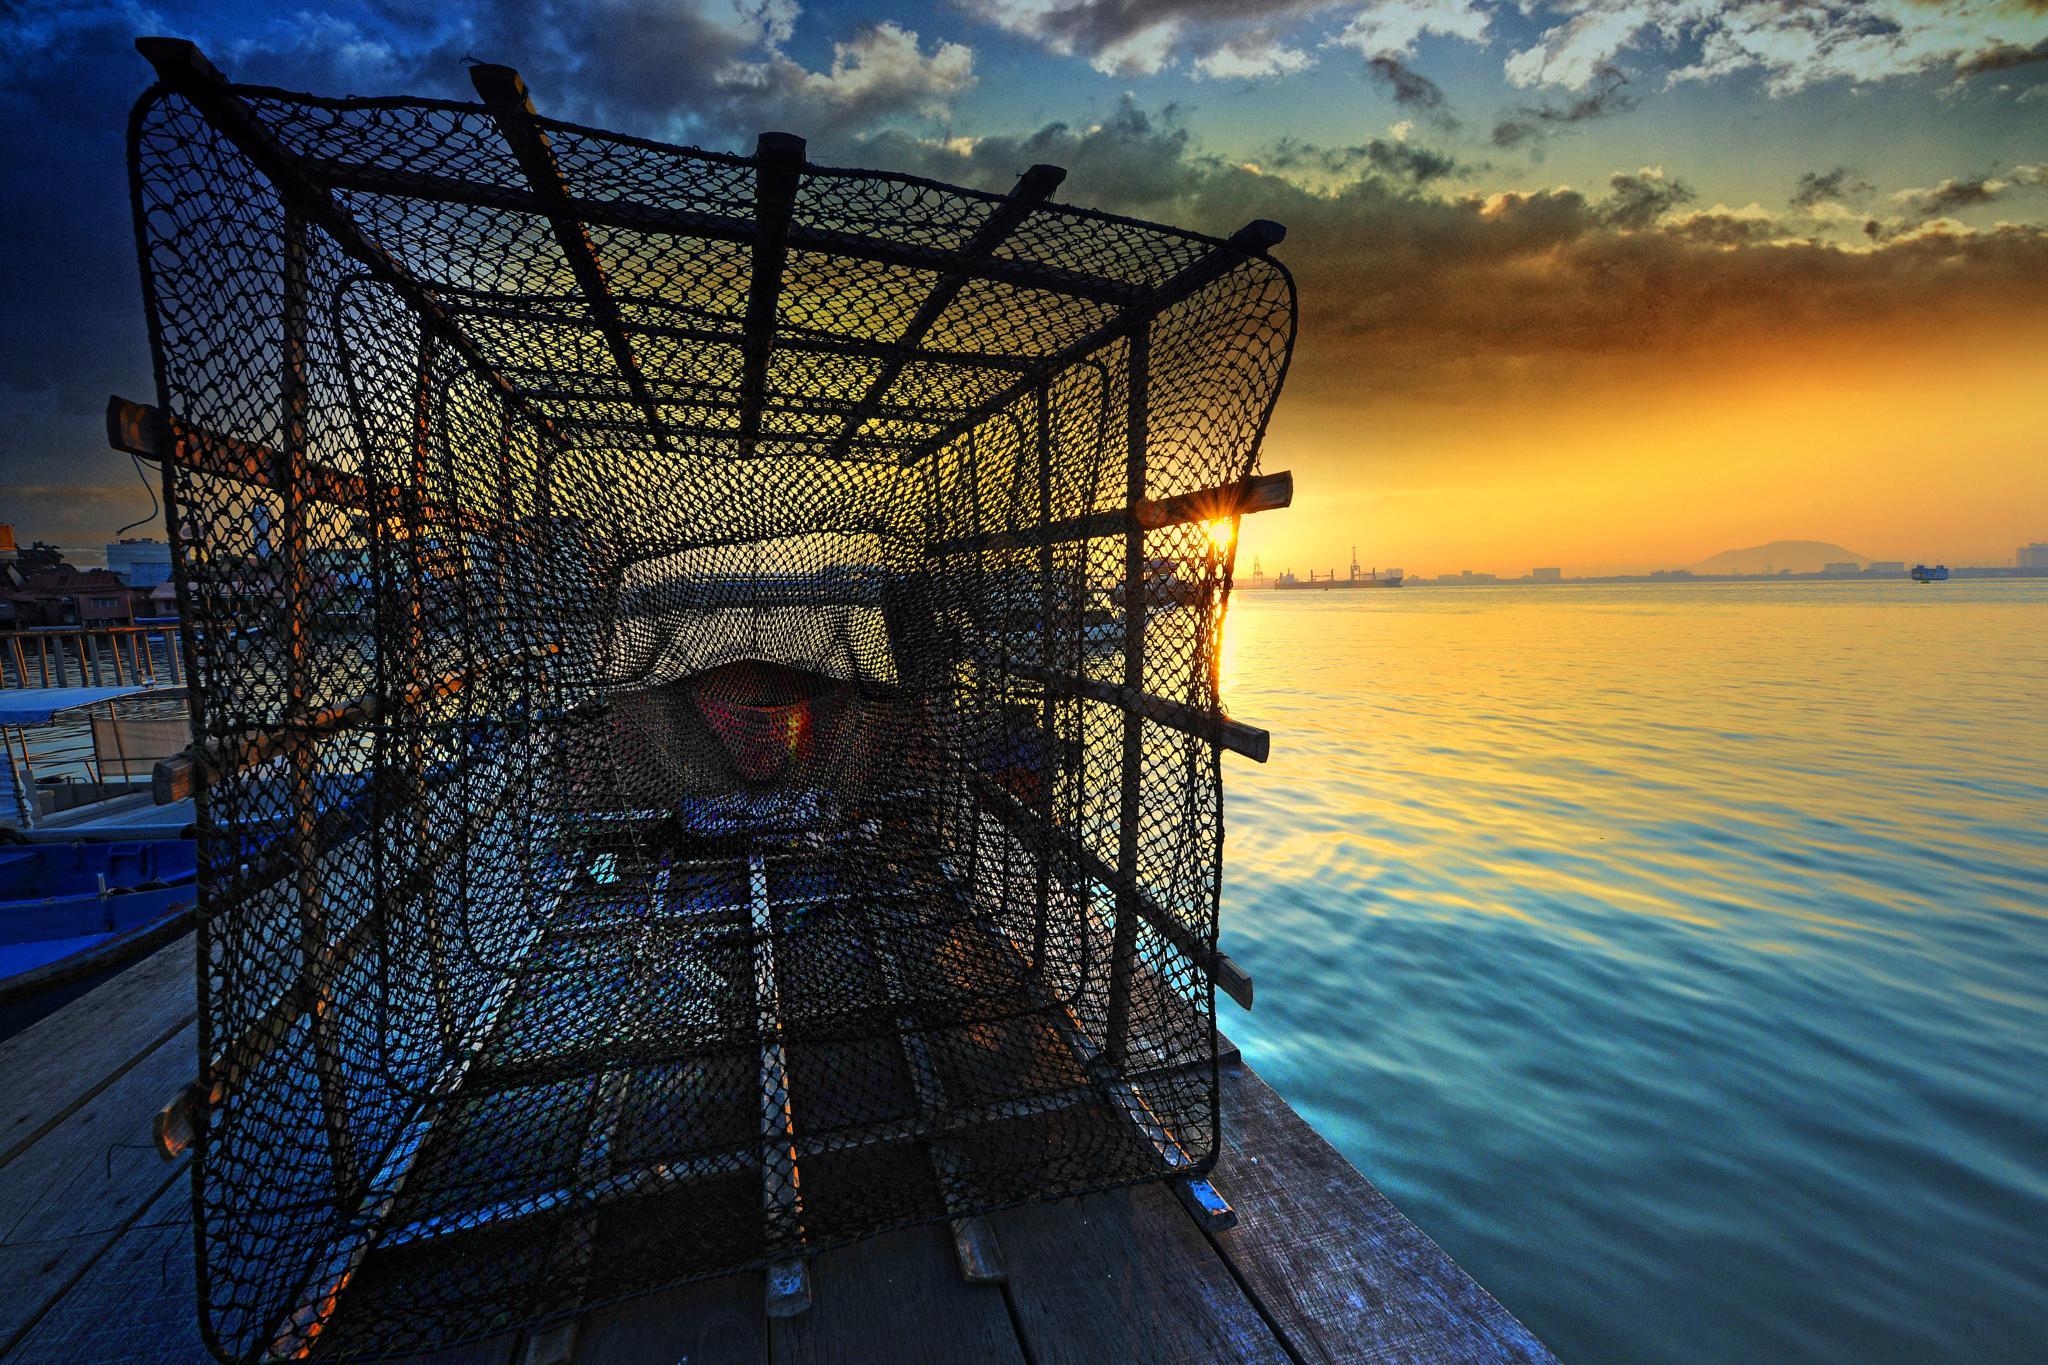 FISHERMAN WEAPON by SAM LIM